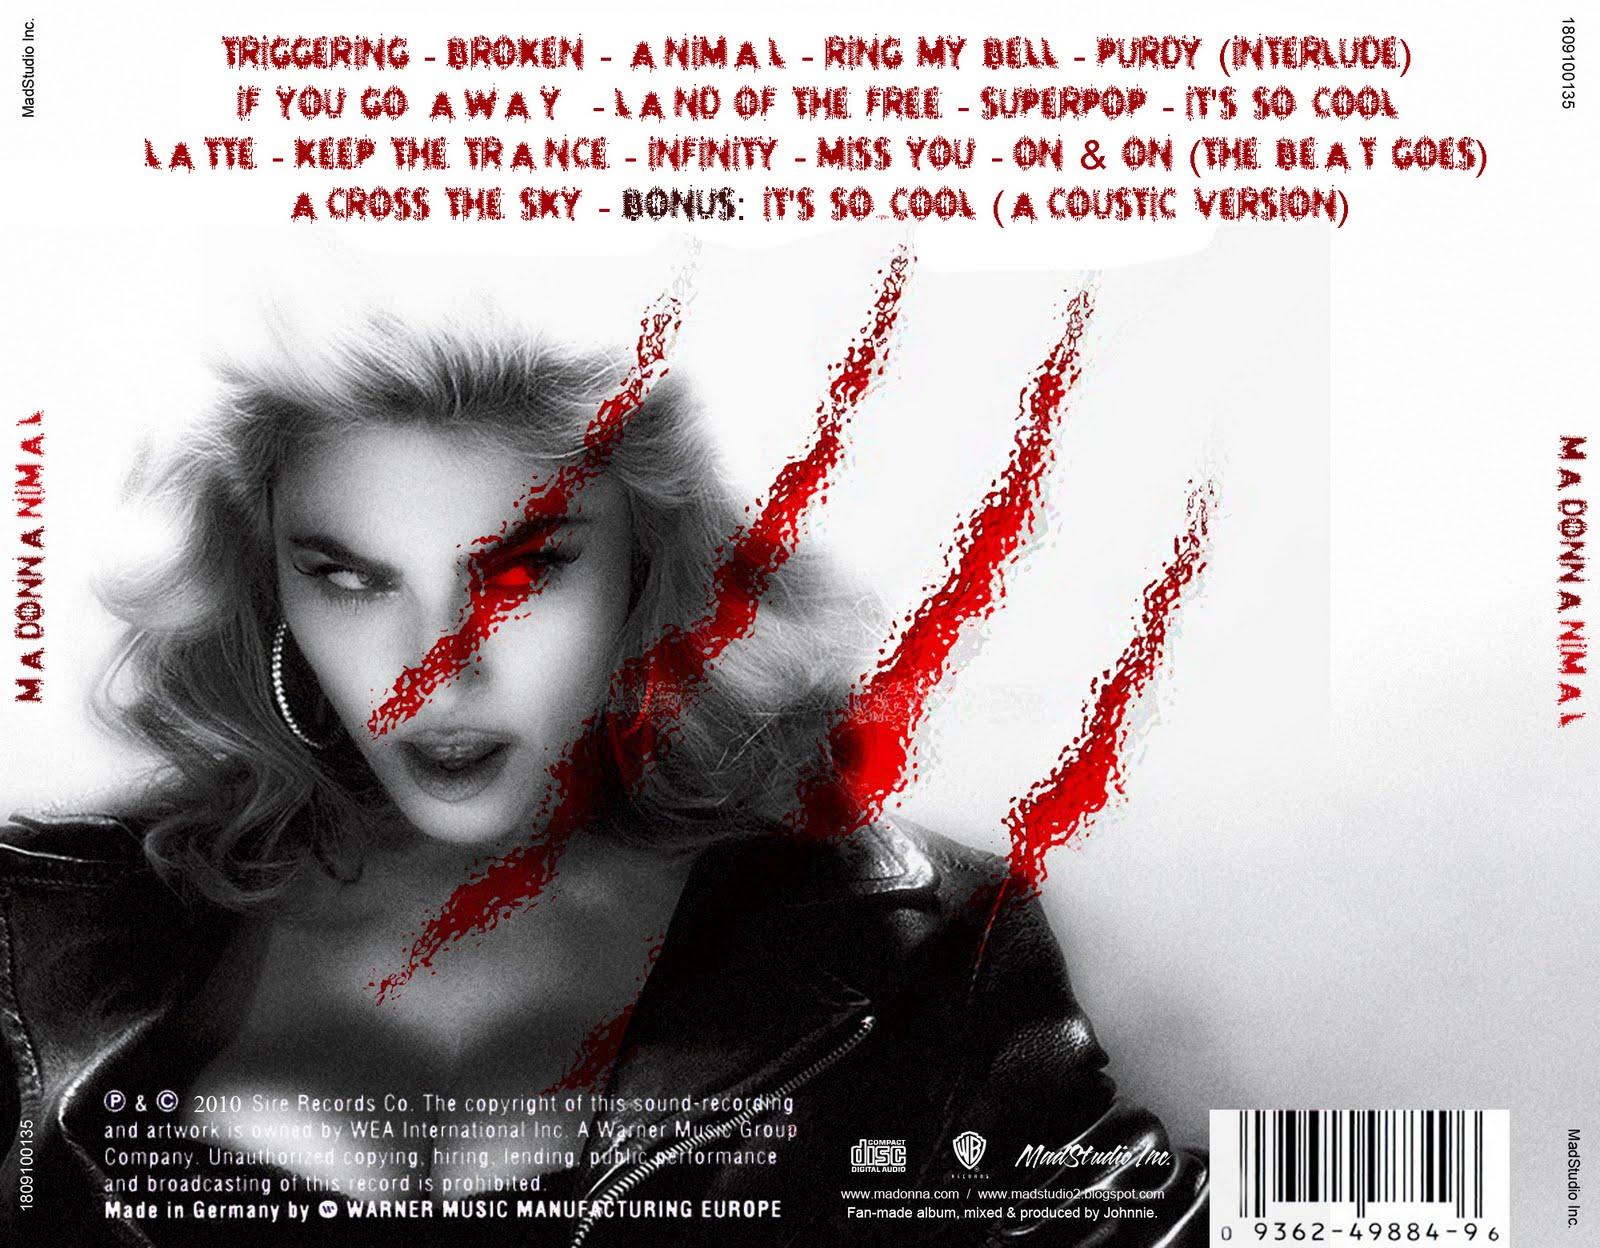 madonna flac torrent discography